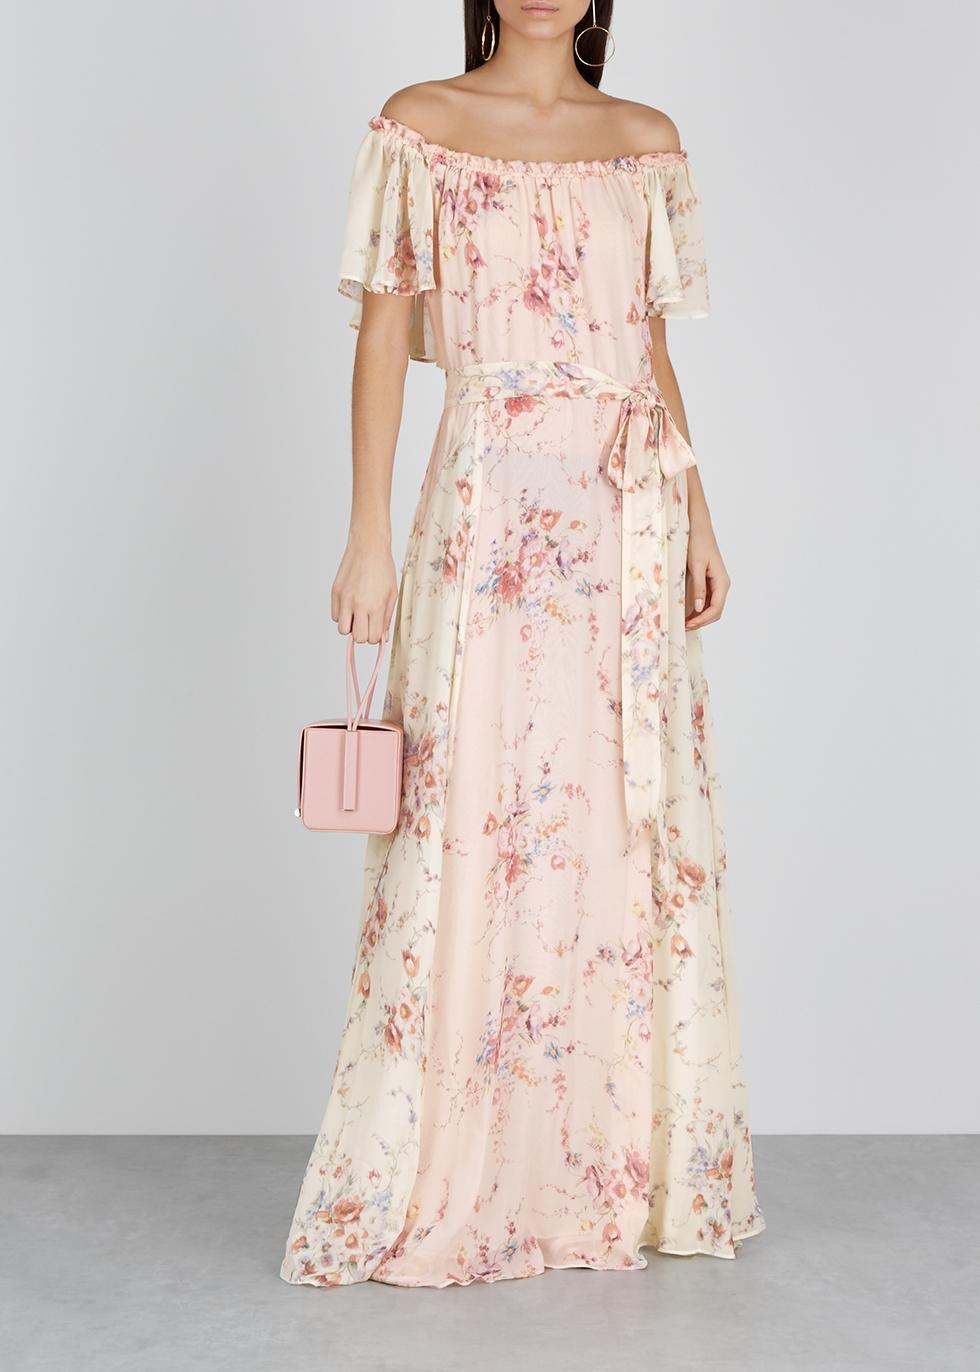 Evelyn floral-print silk maxi dress - LoveShackFancy